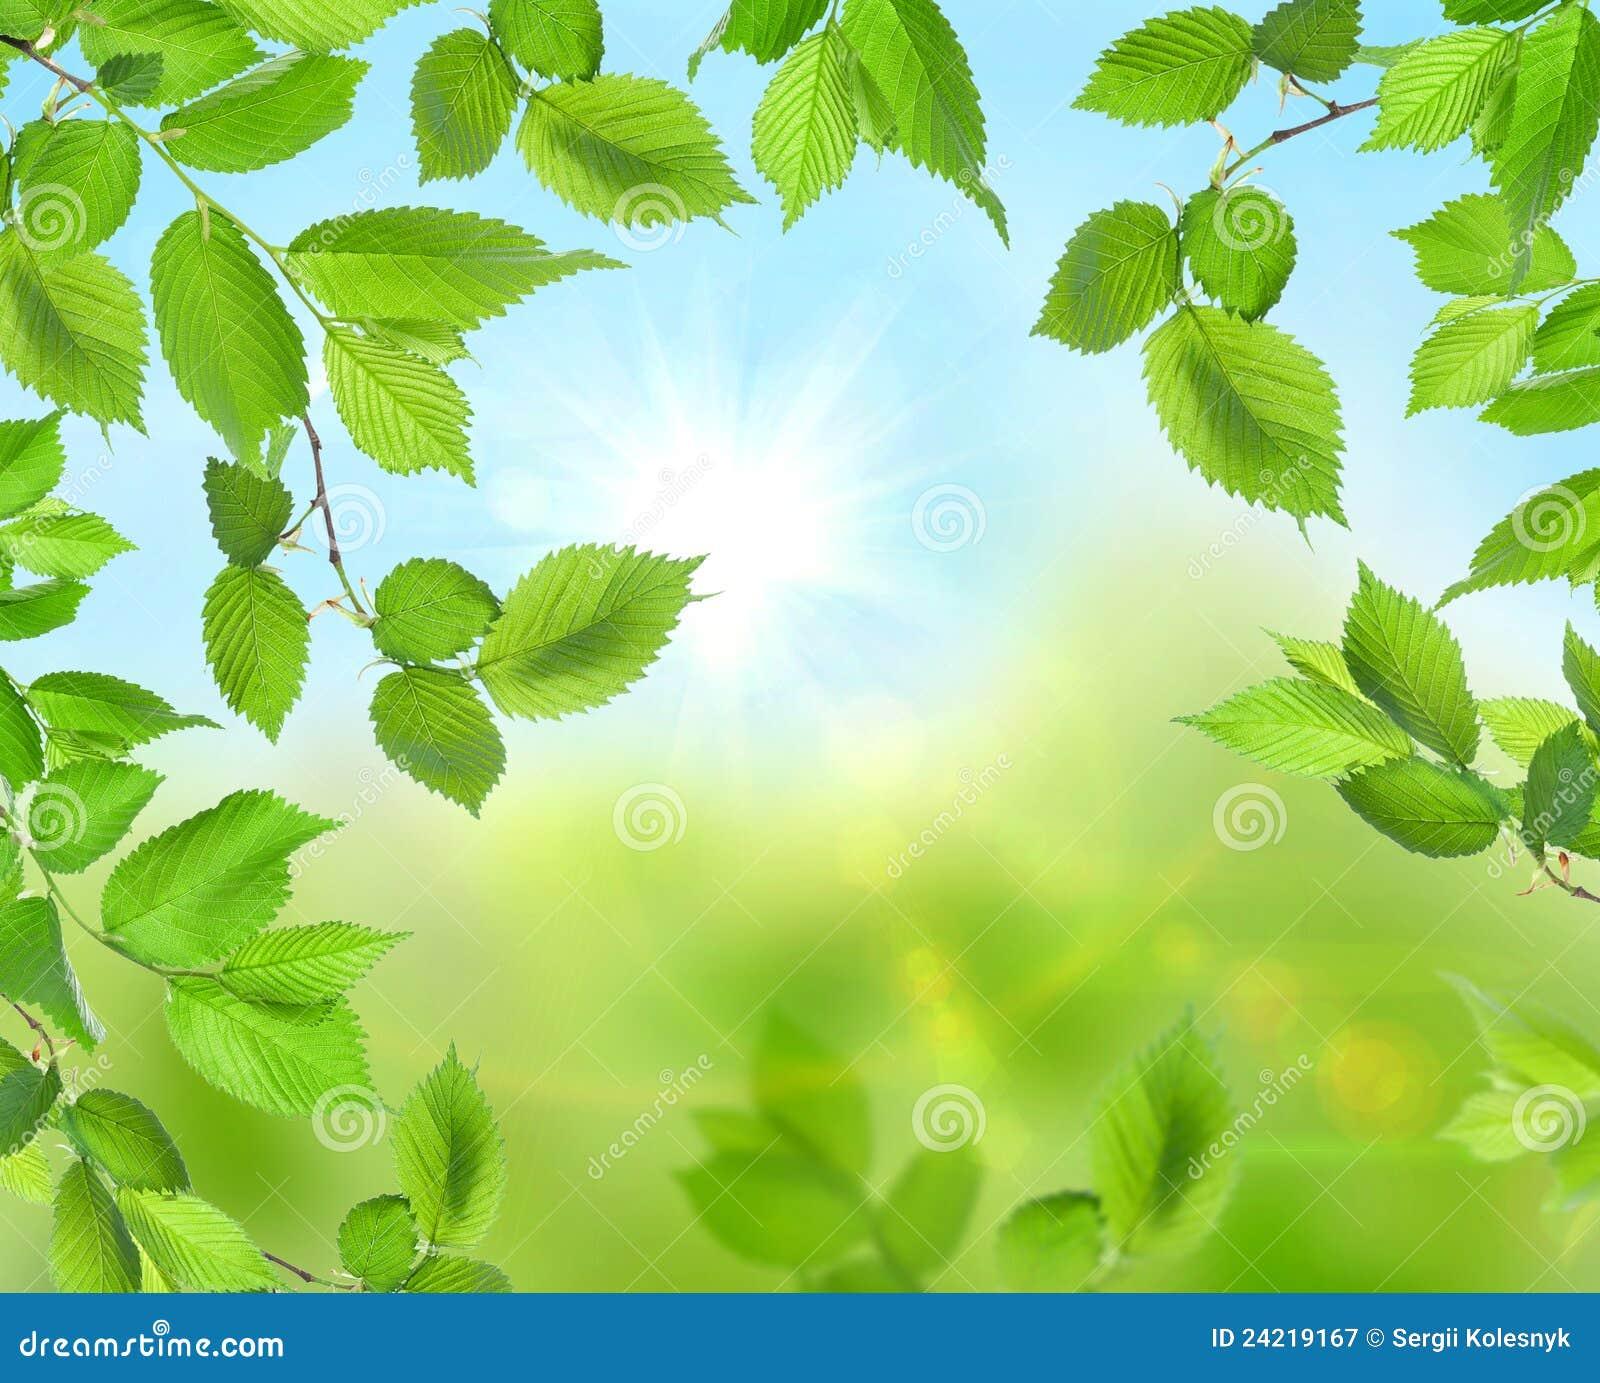 Beautiful Soft Green Background Royalty Free Stock Photography - Image: 24219167 - photo#33